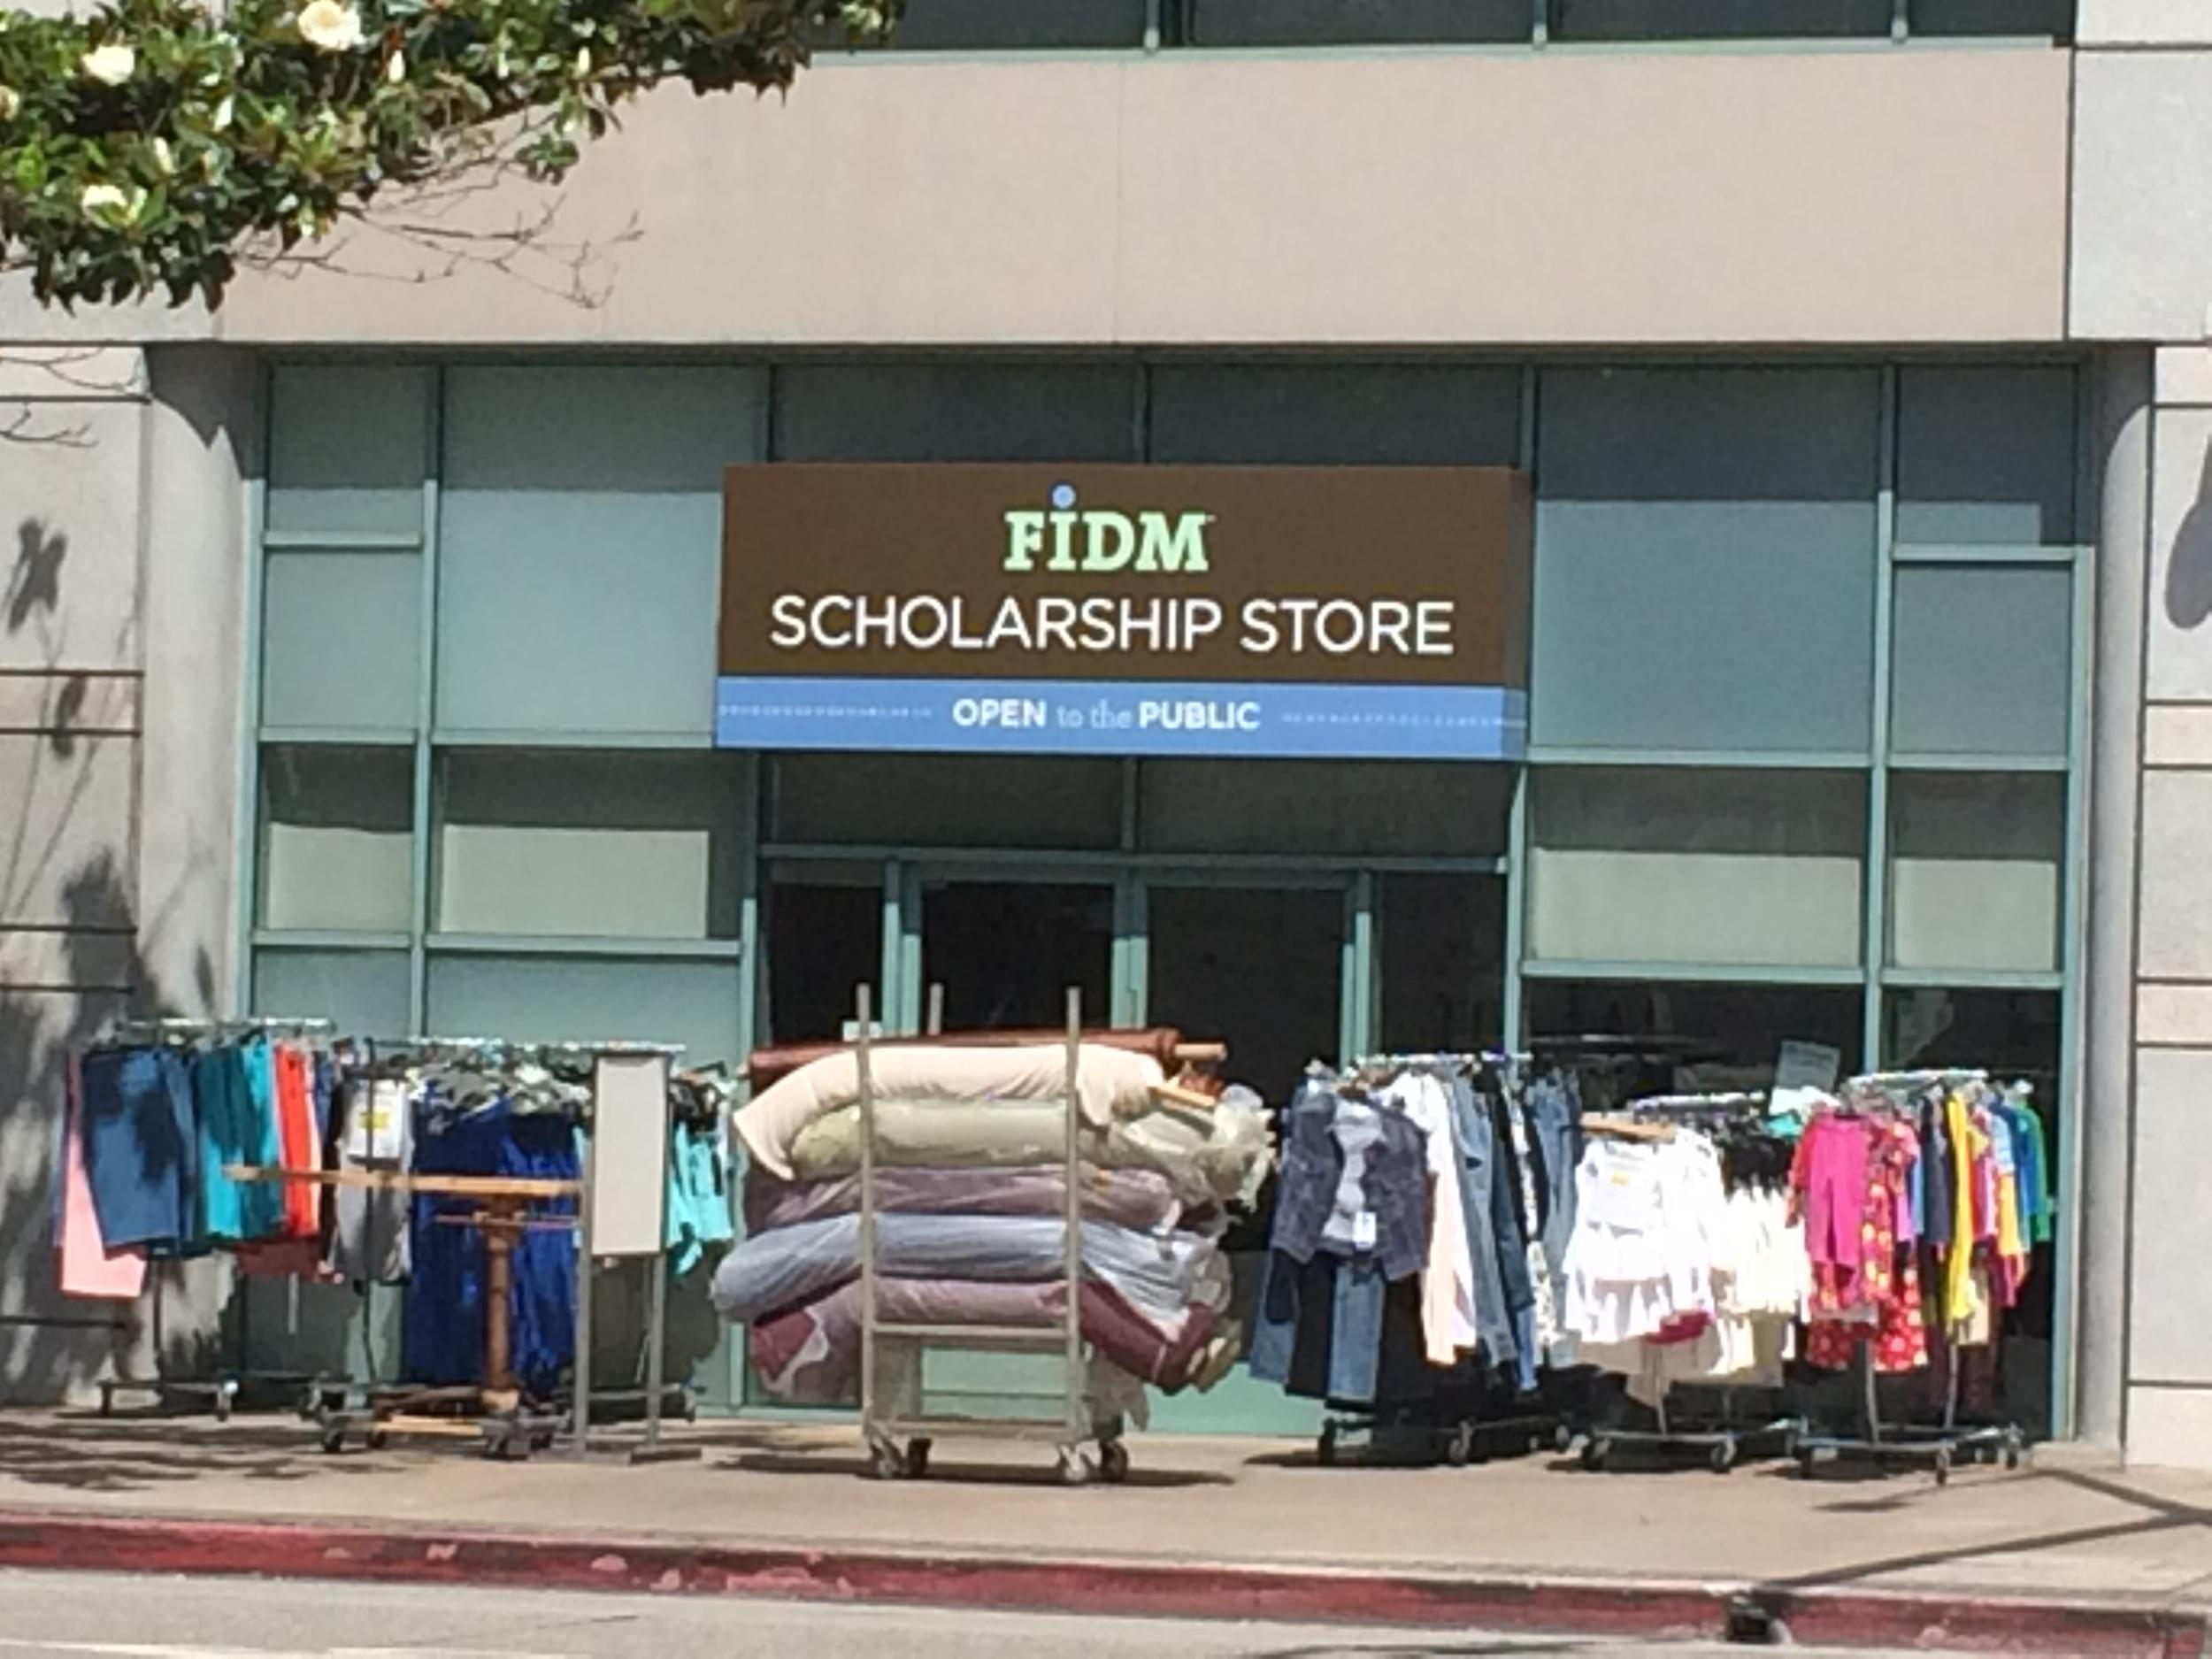 The FIDM Scholarship store.